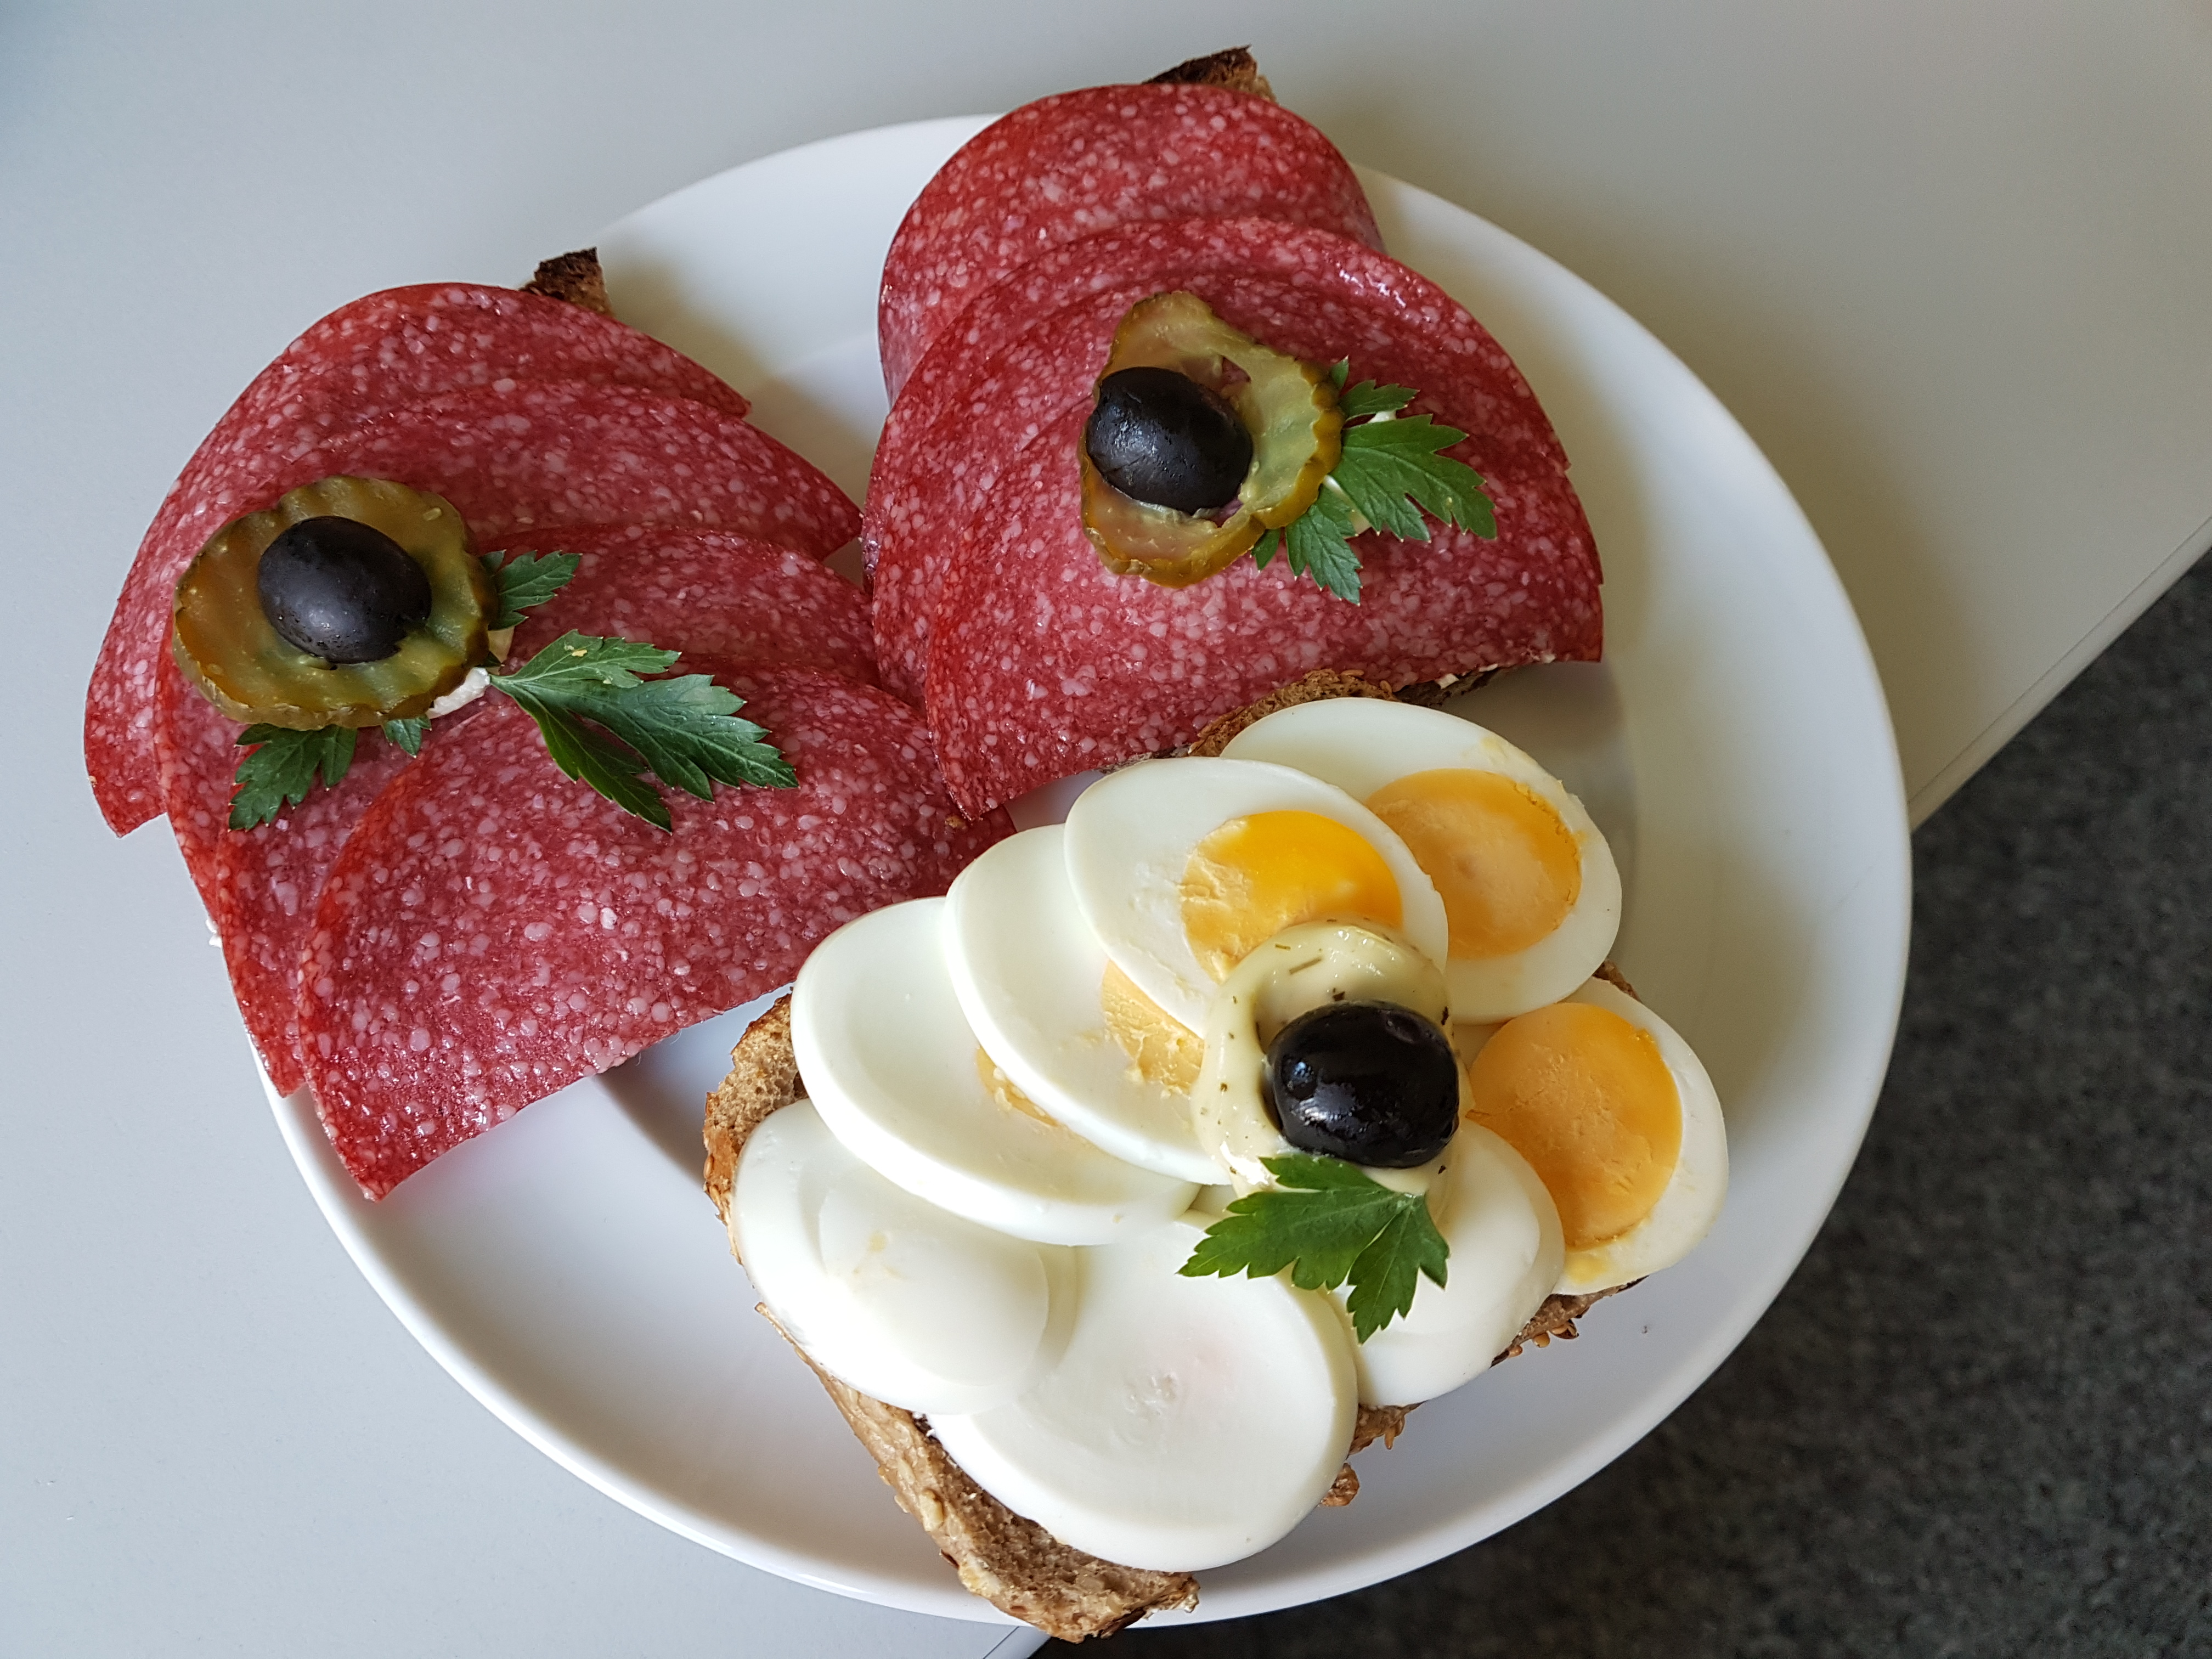 http://foodloader.net/Holz_2017-07-05_Snacks.jpg